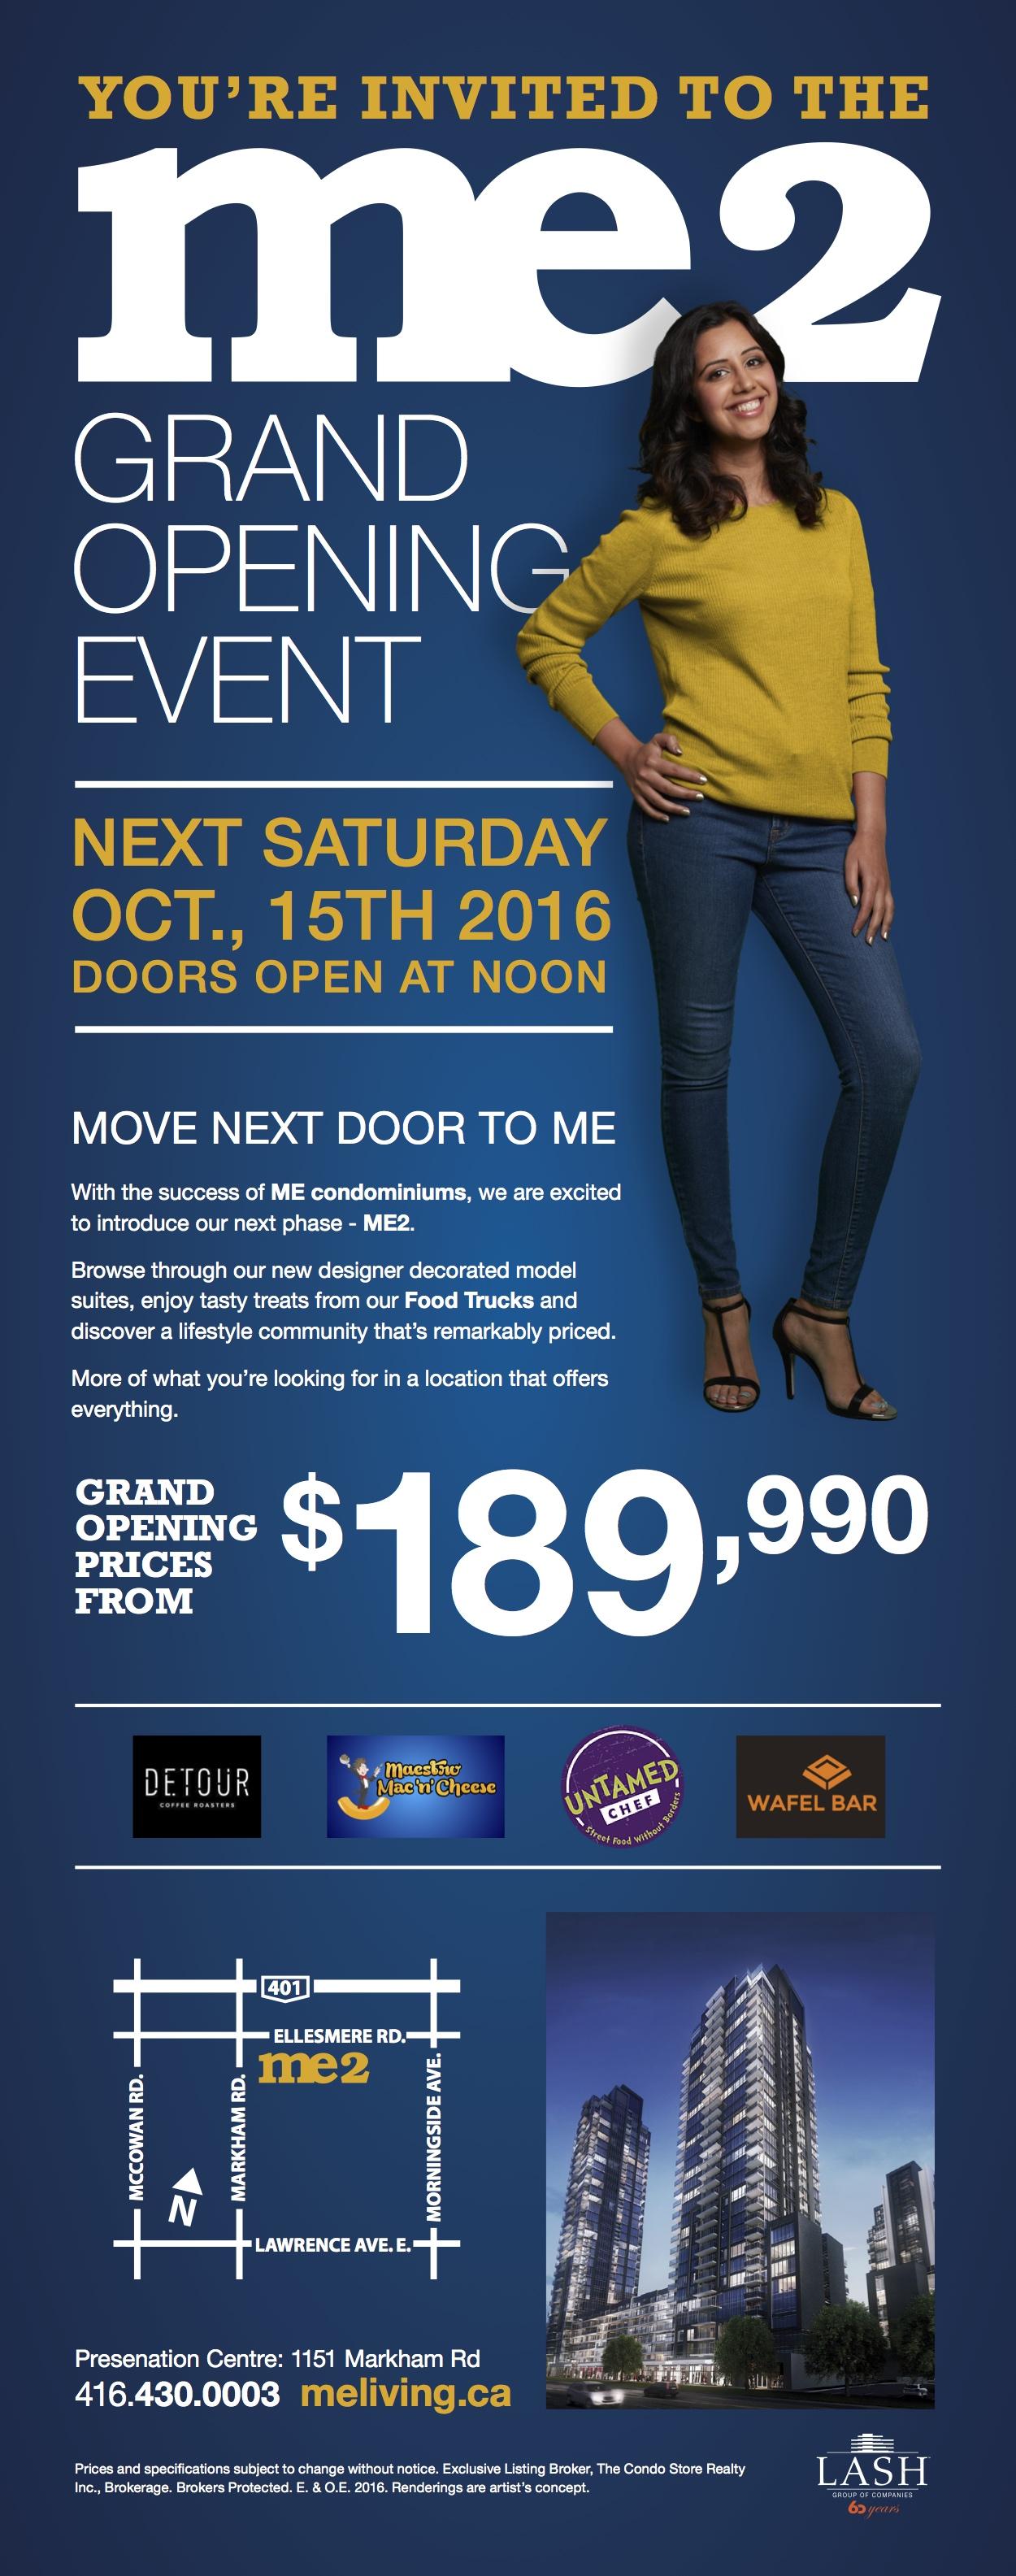 me2-living-condos-grand-opening-event-condo